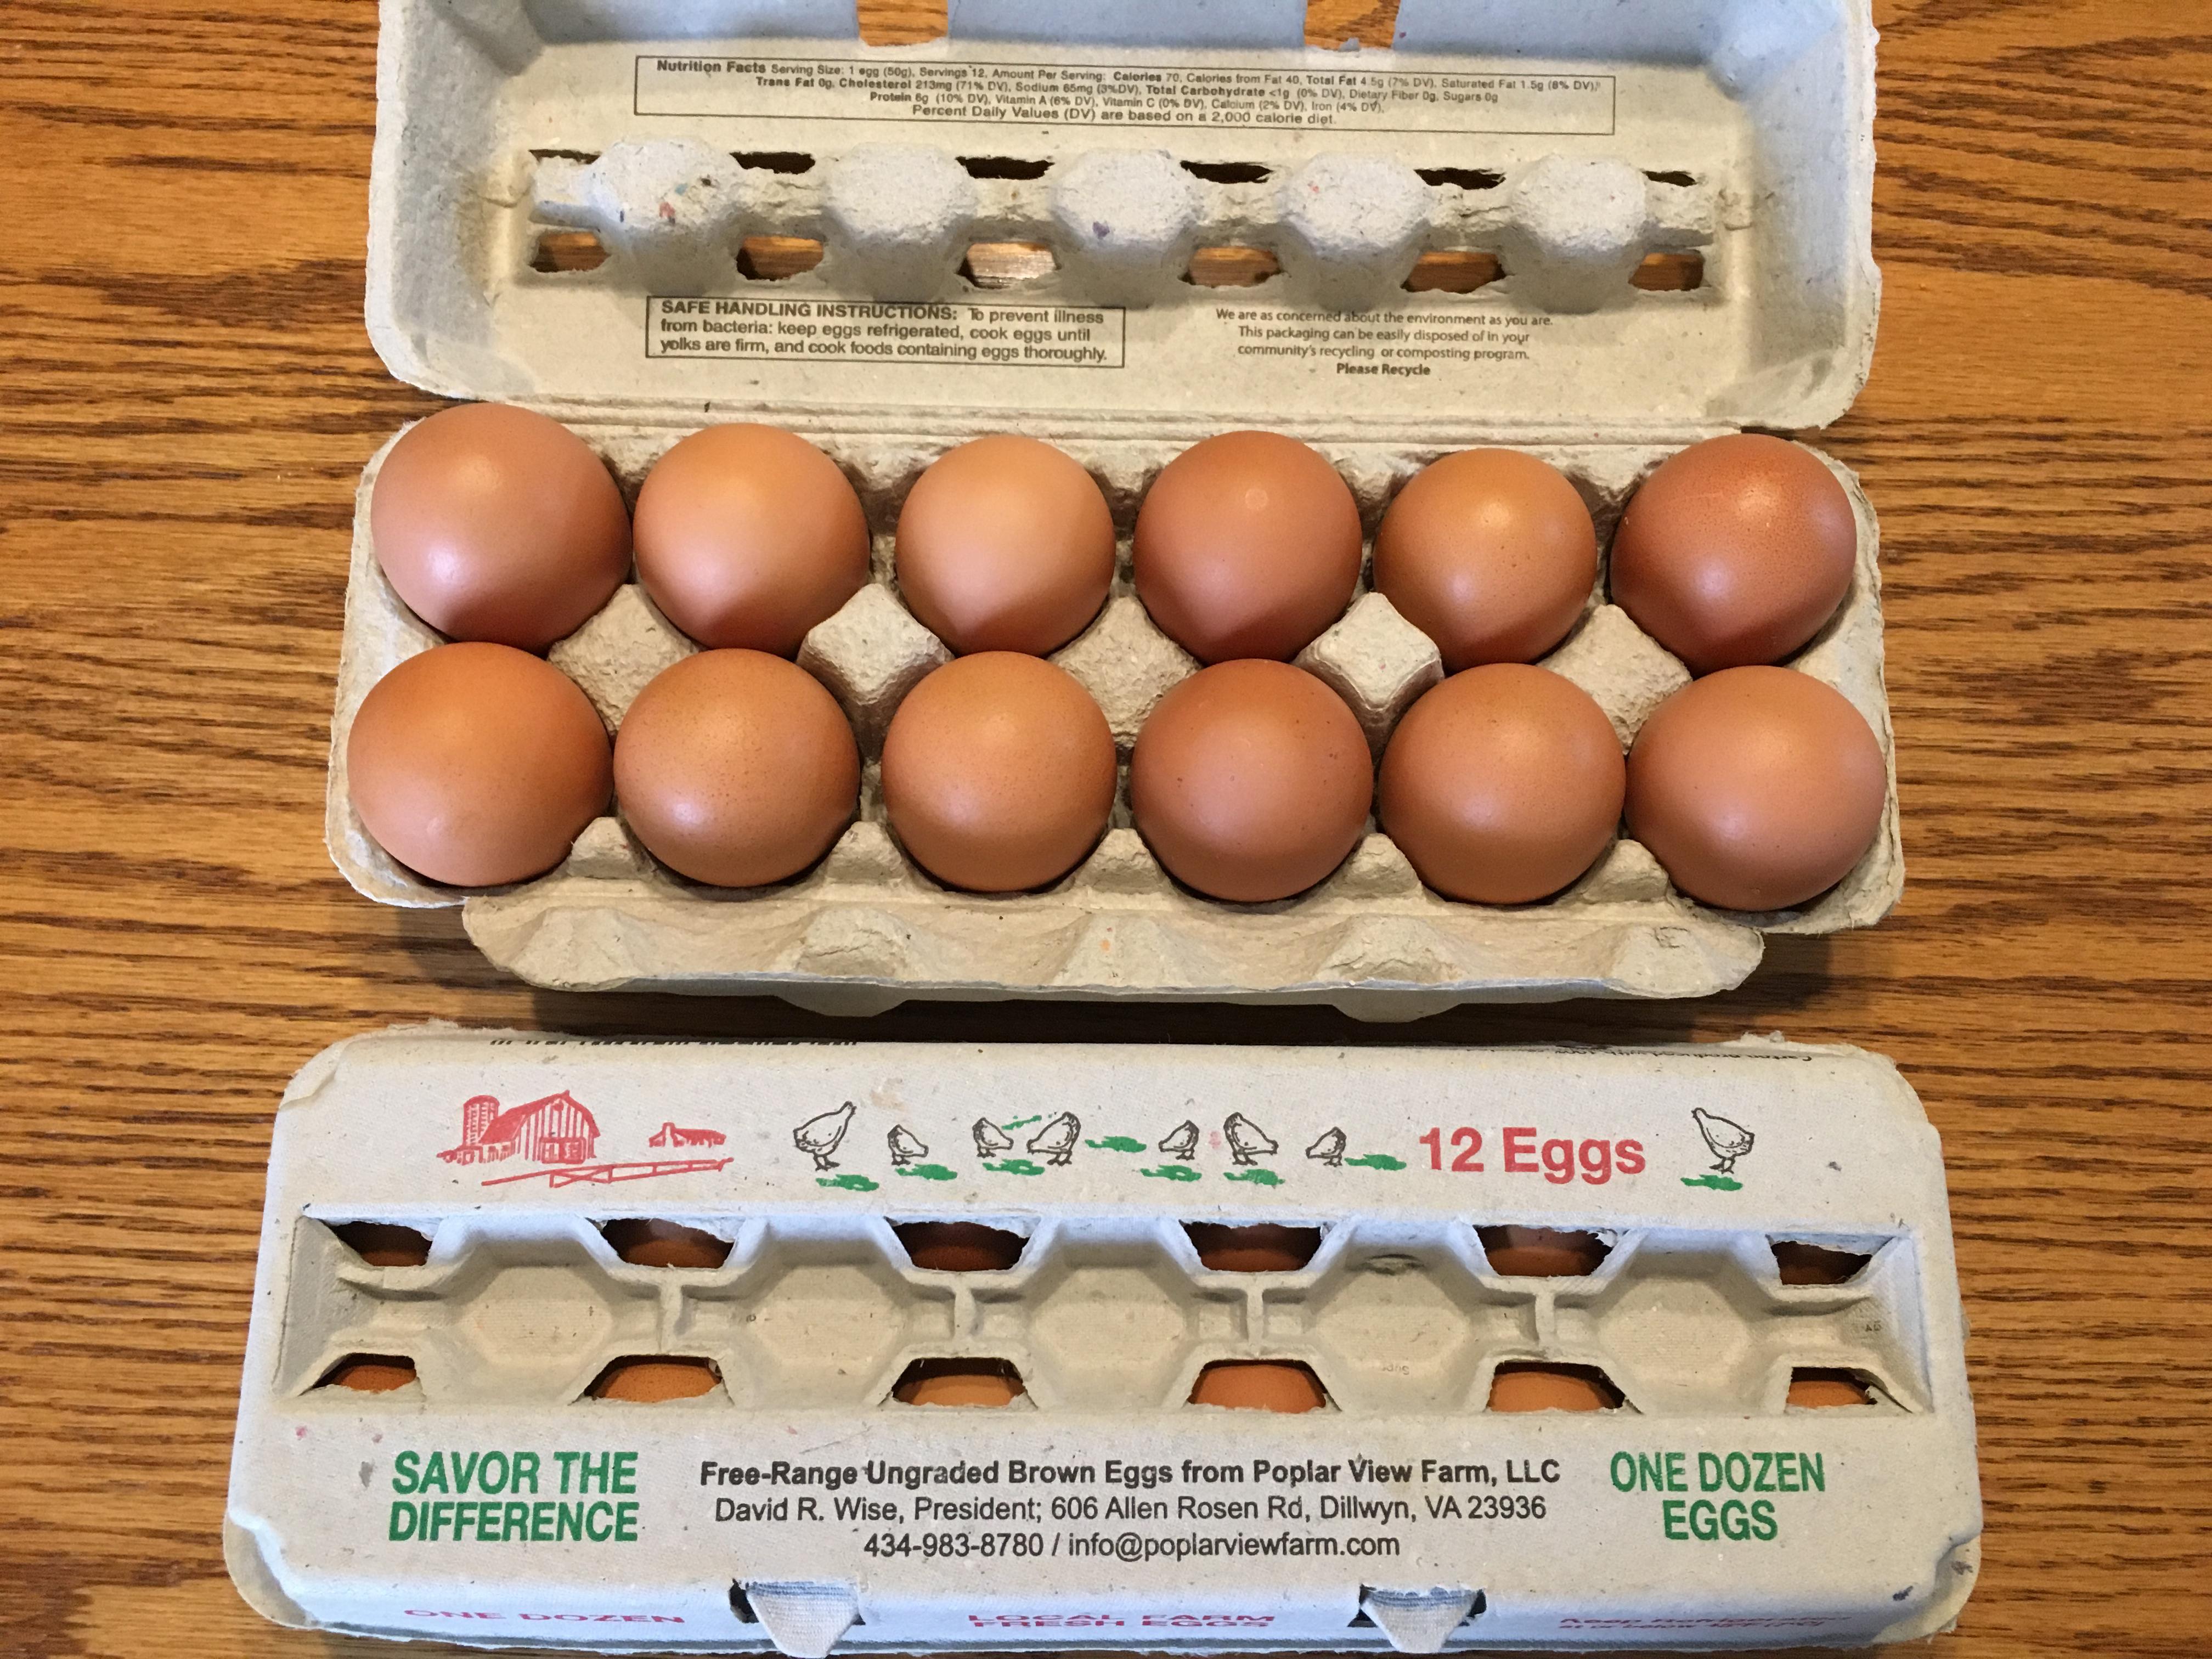 Eggs: 1 Dozen